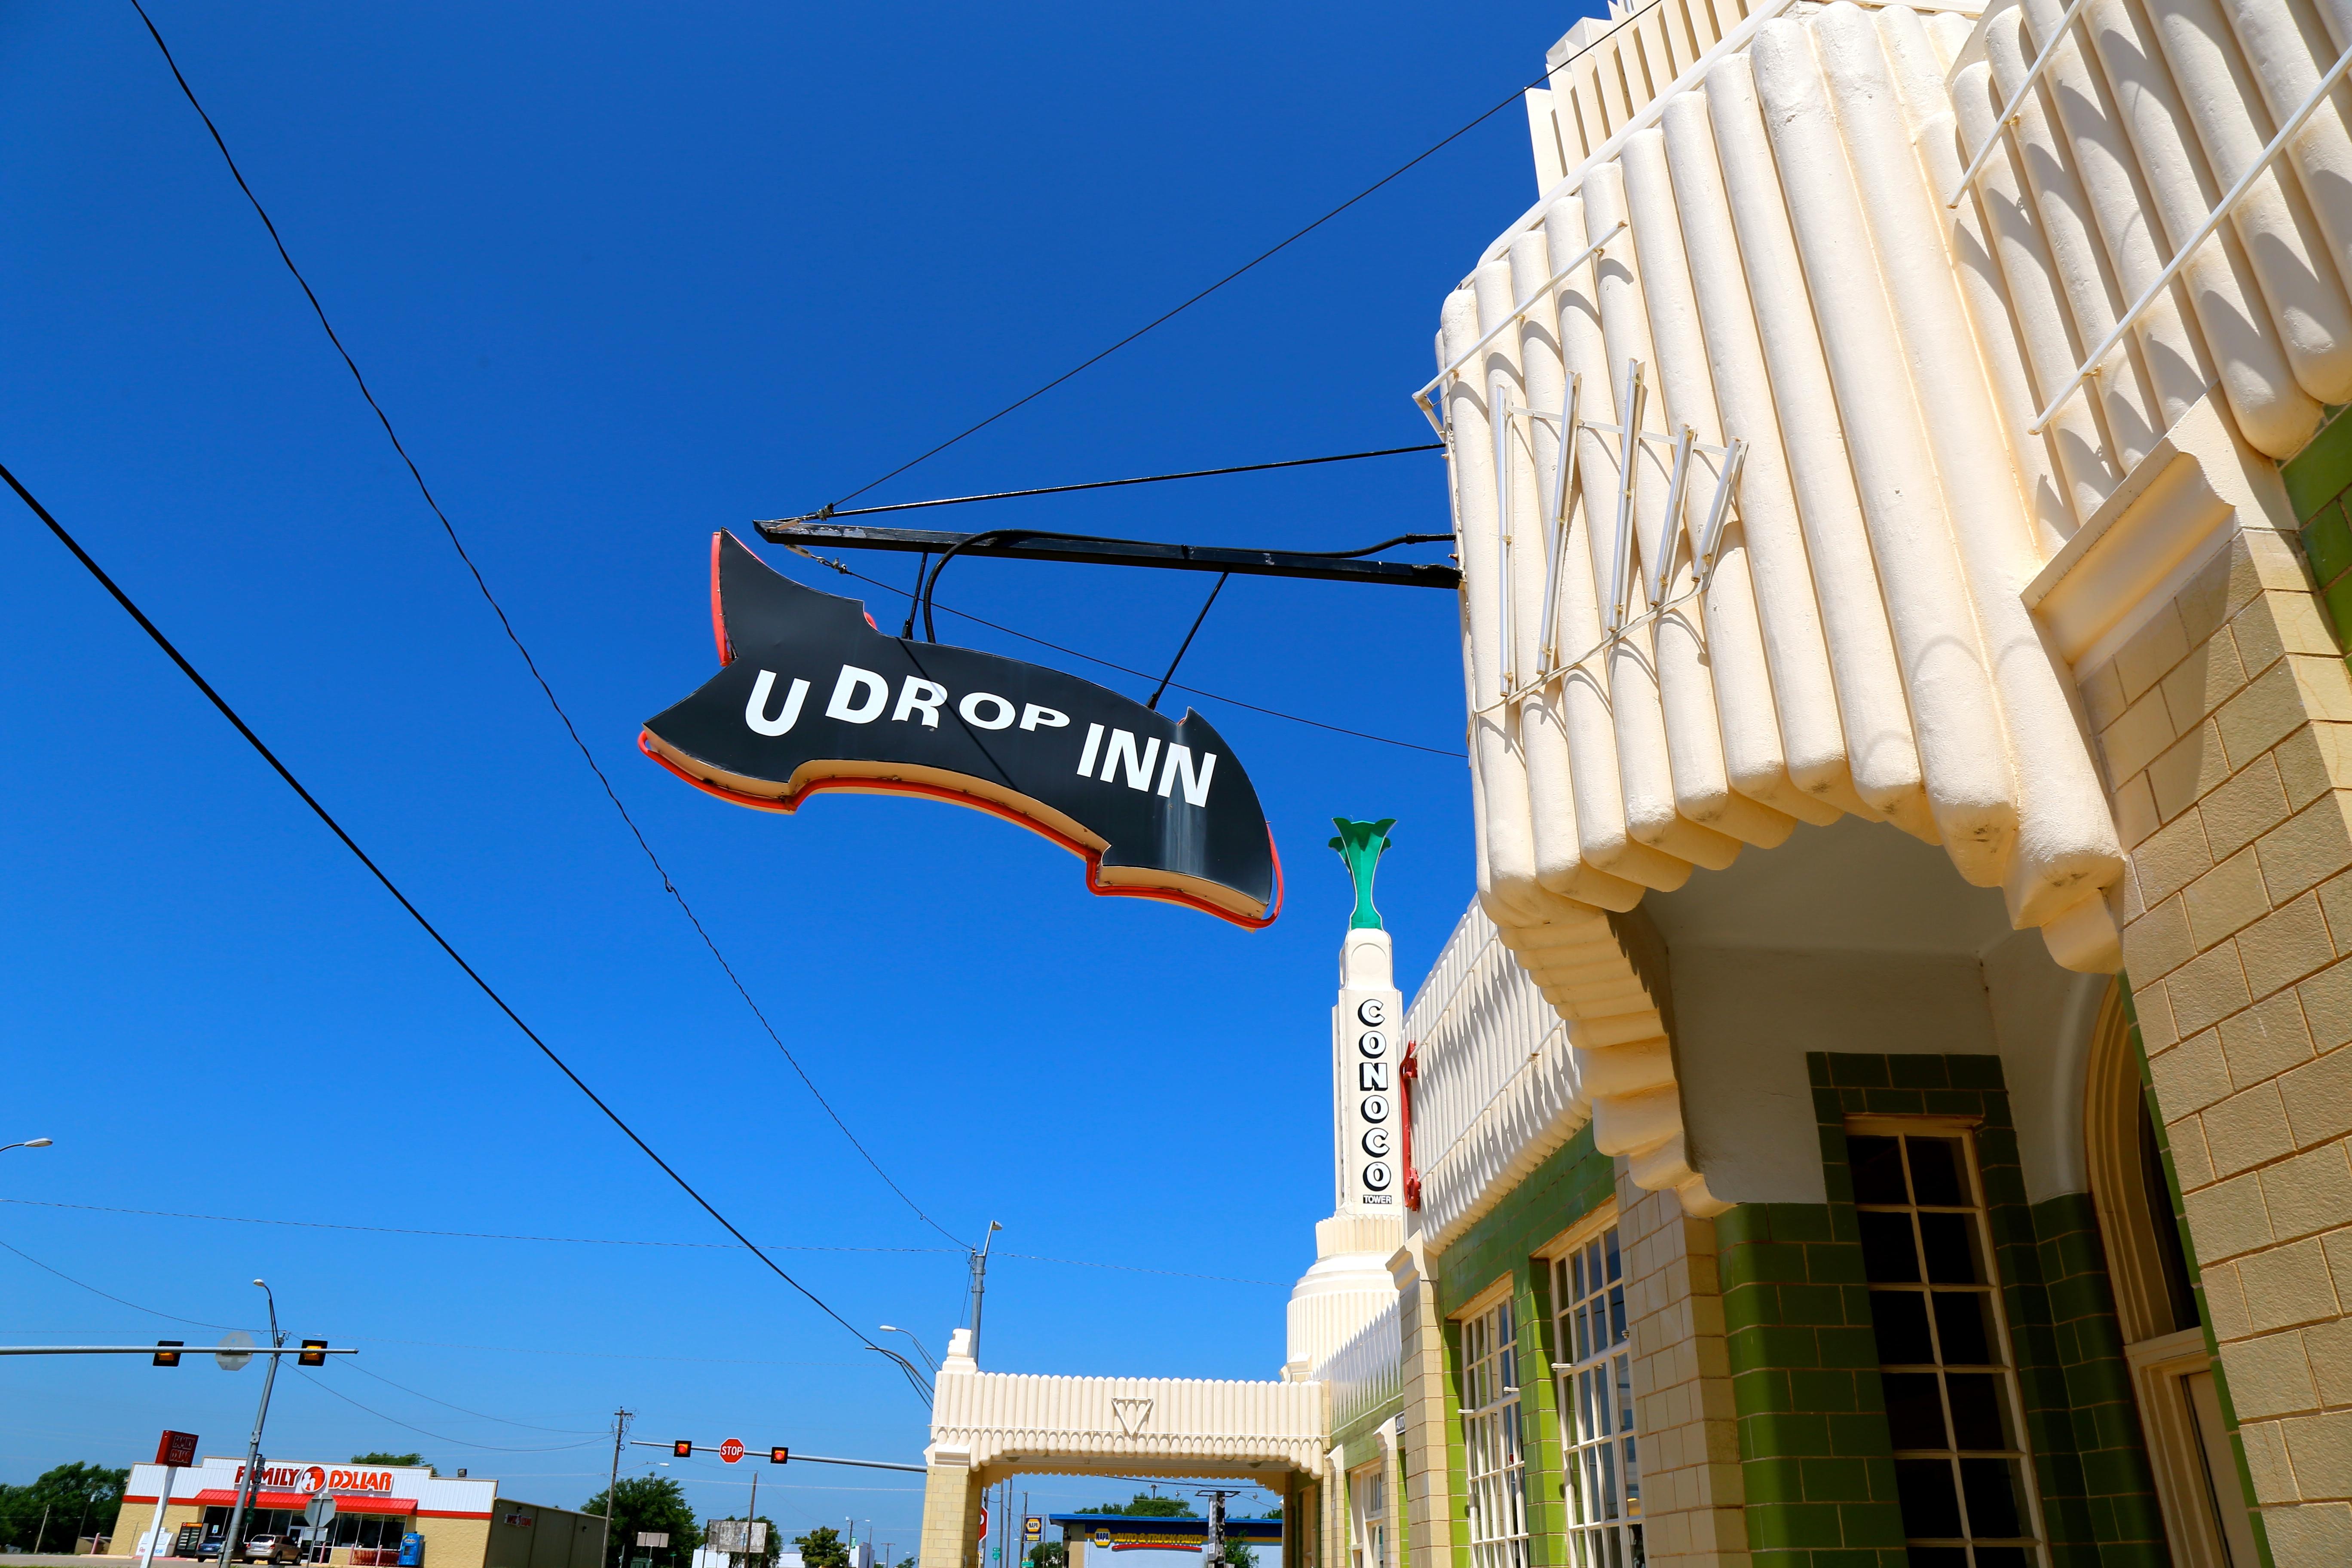 Station U-Drop Inn | Lost In The USA